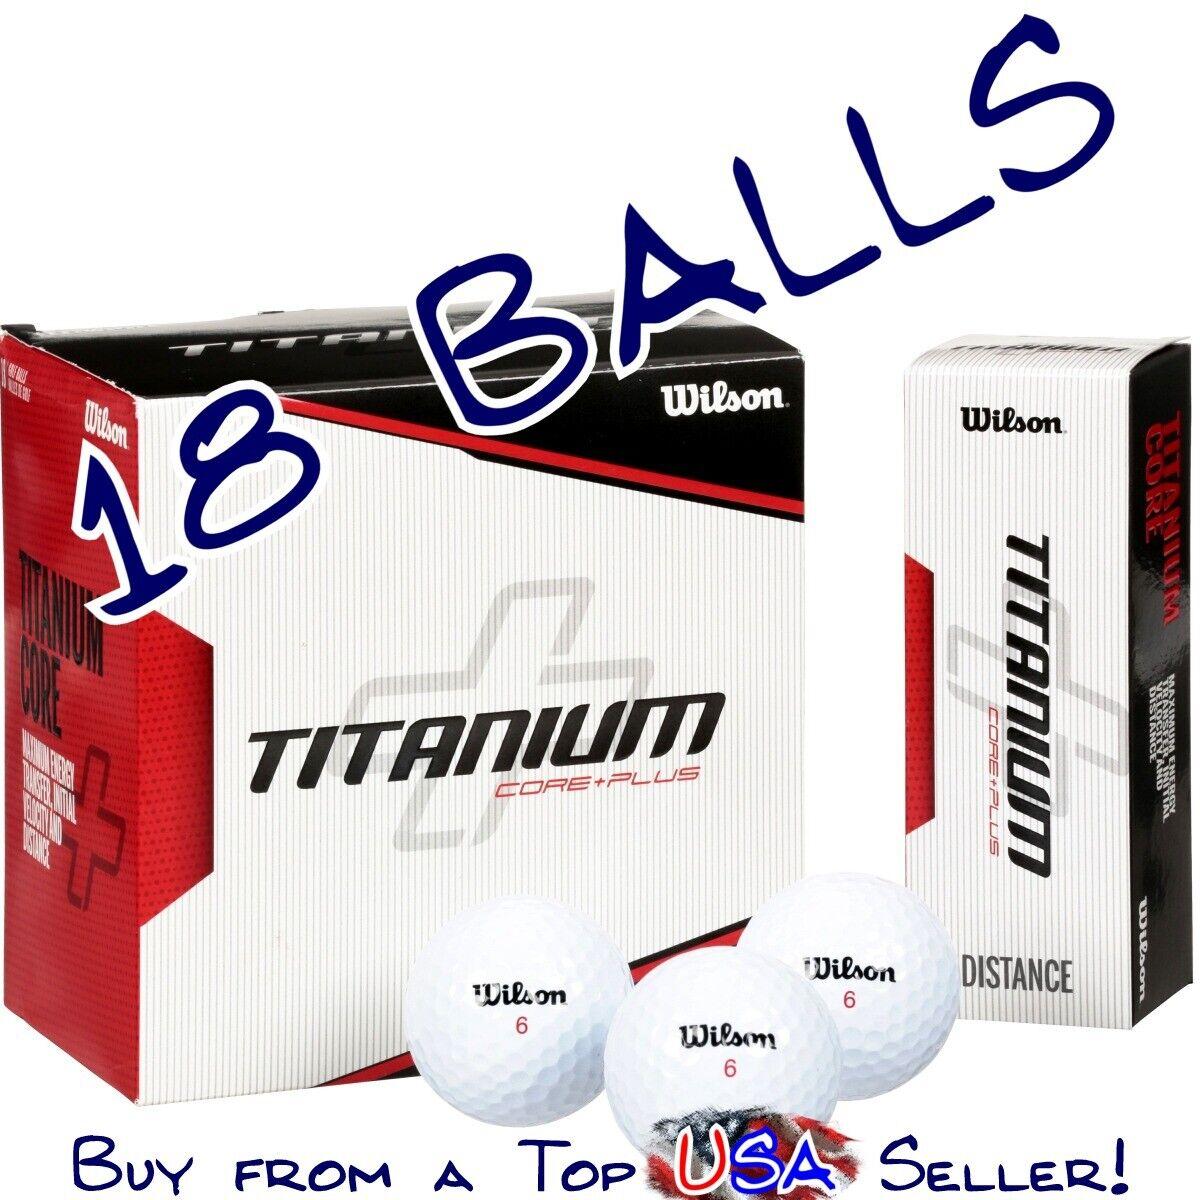 NEW~~~ Wilson Titanium Core Plus Distance 18 Golf Balls with